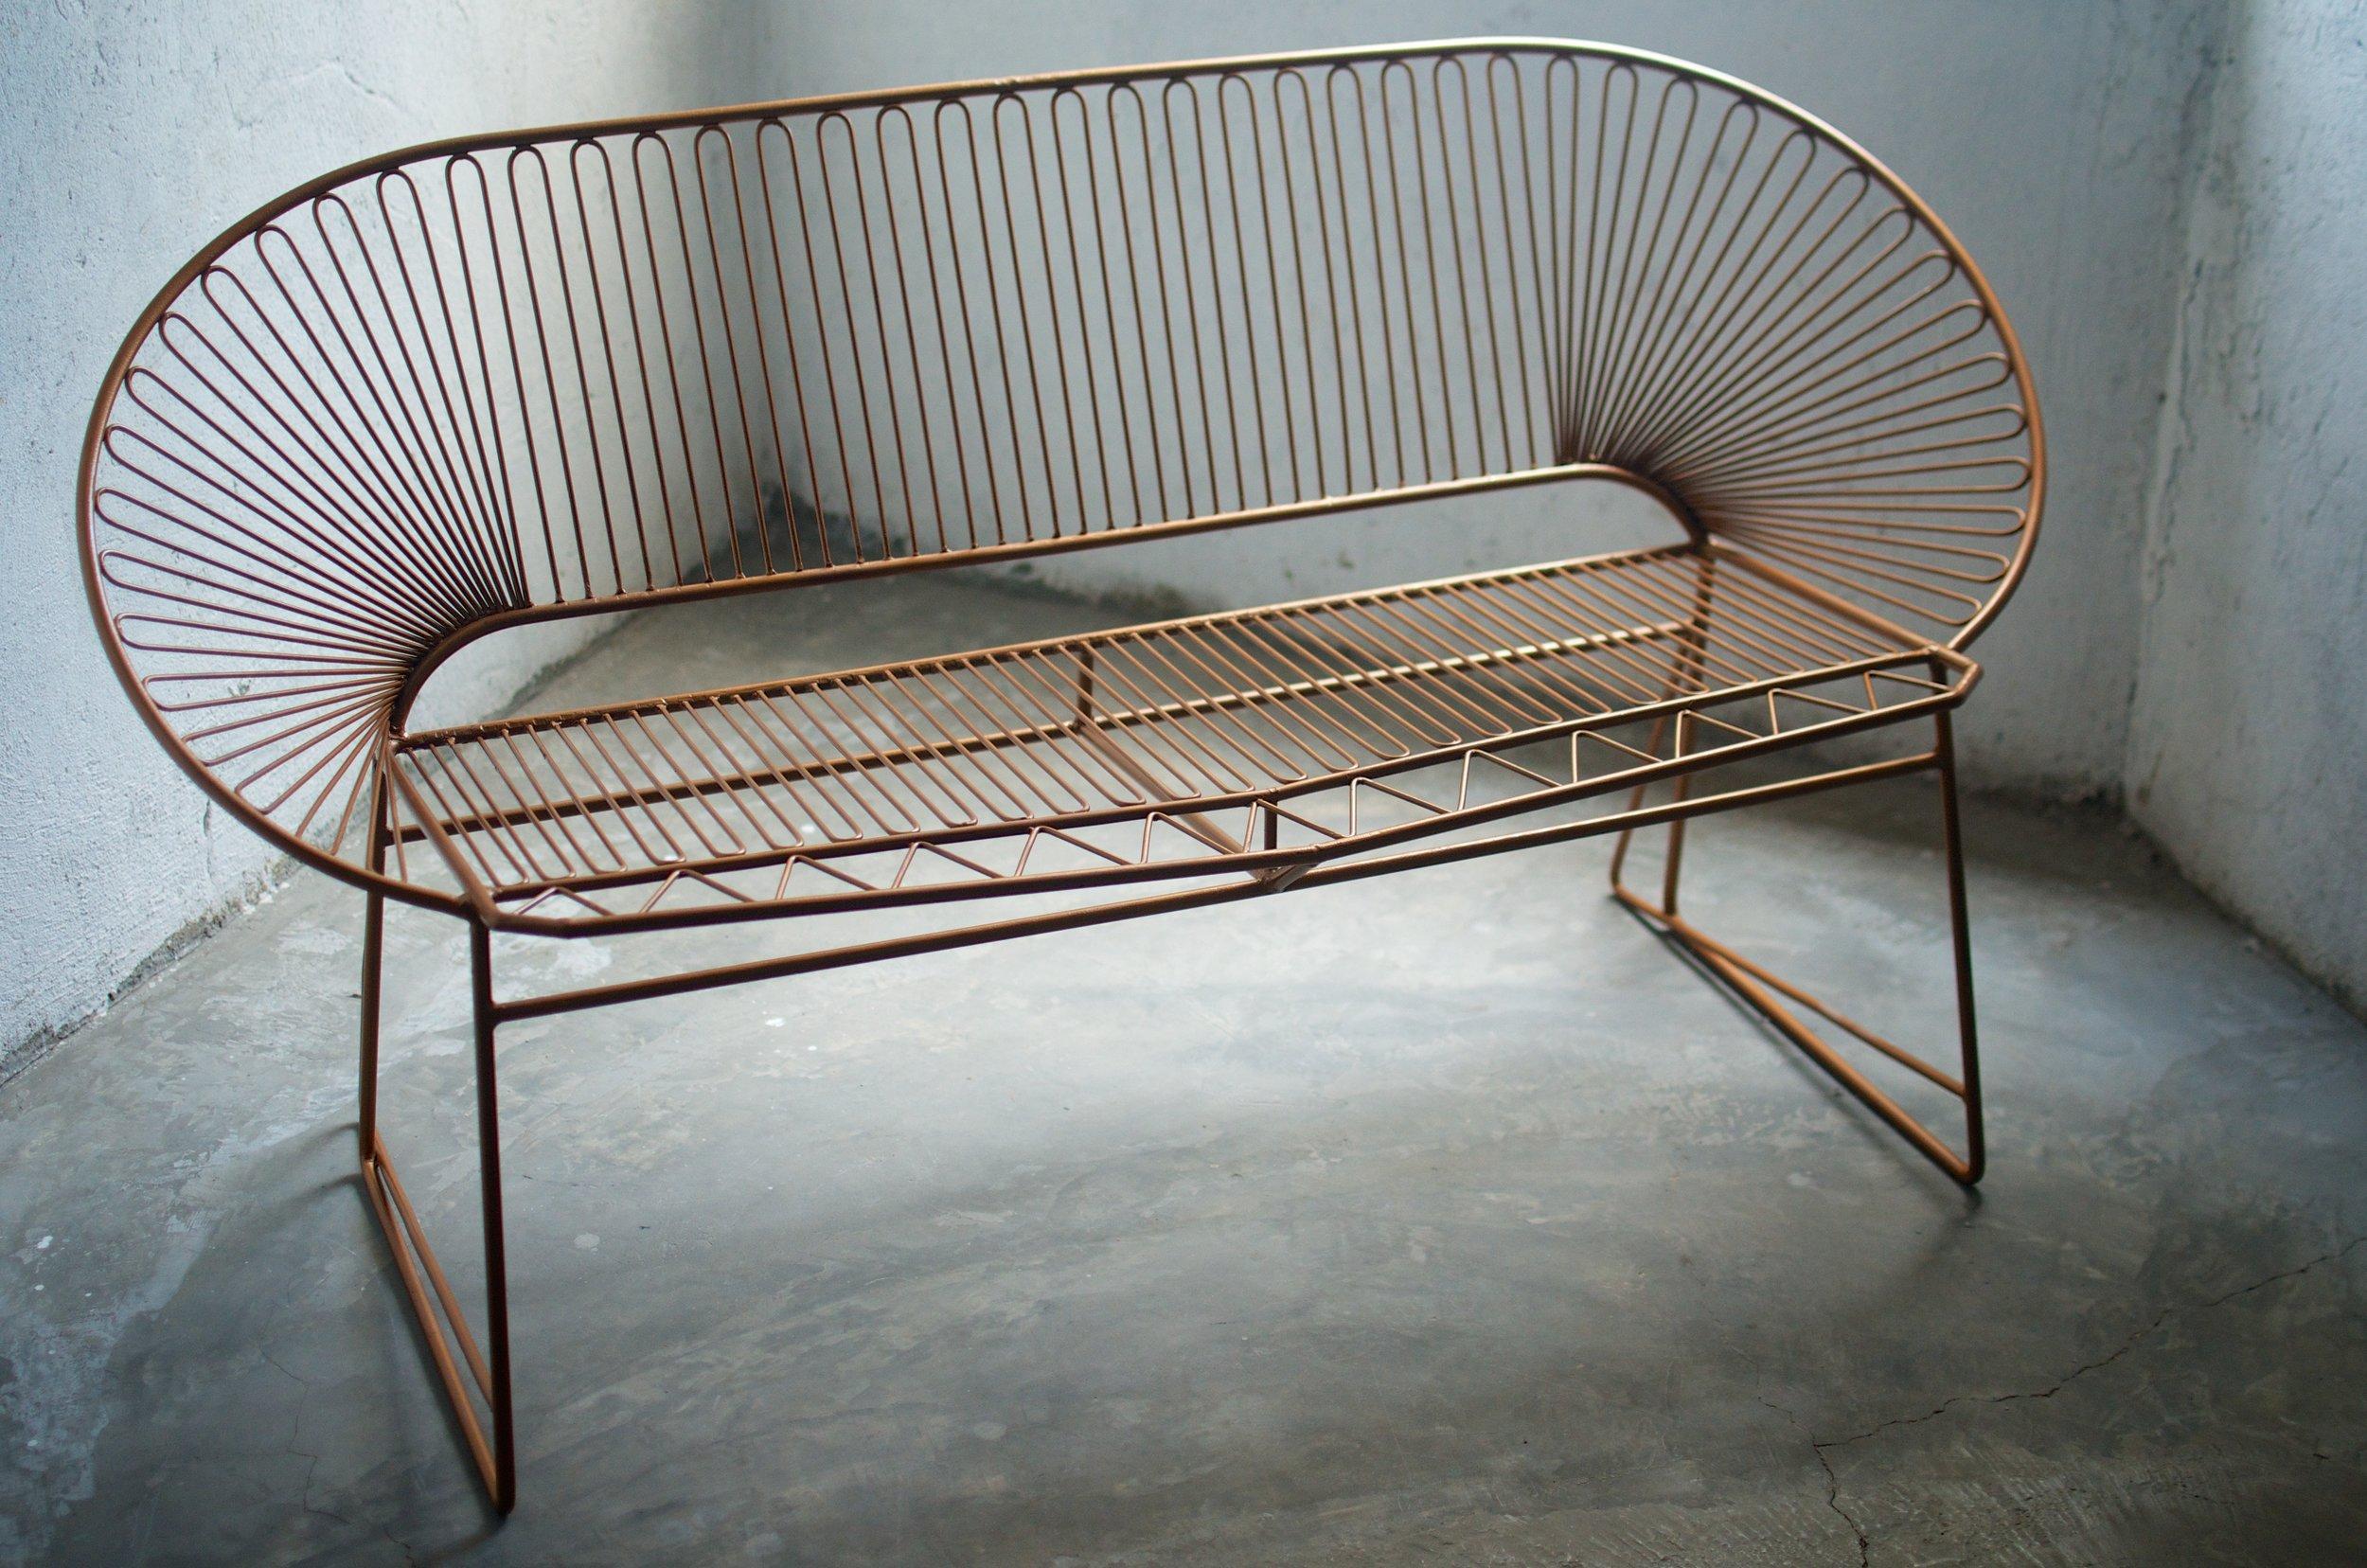 sofa purohierro.jpg